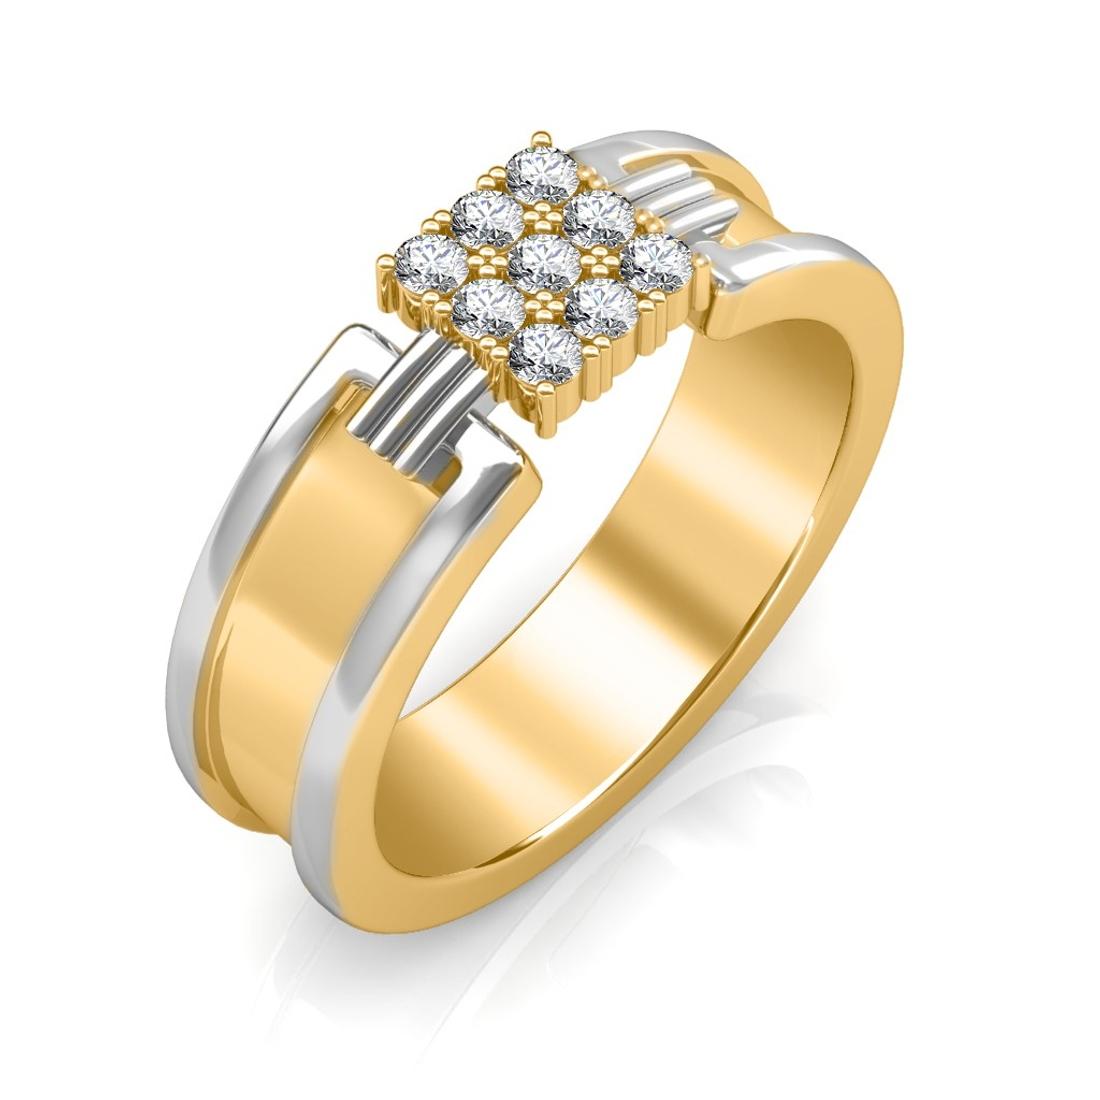 Sarvada Jewels' The Pinnacle Ring For Him